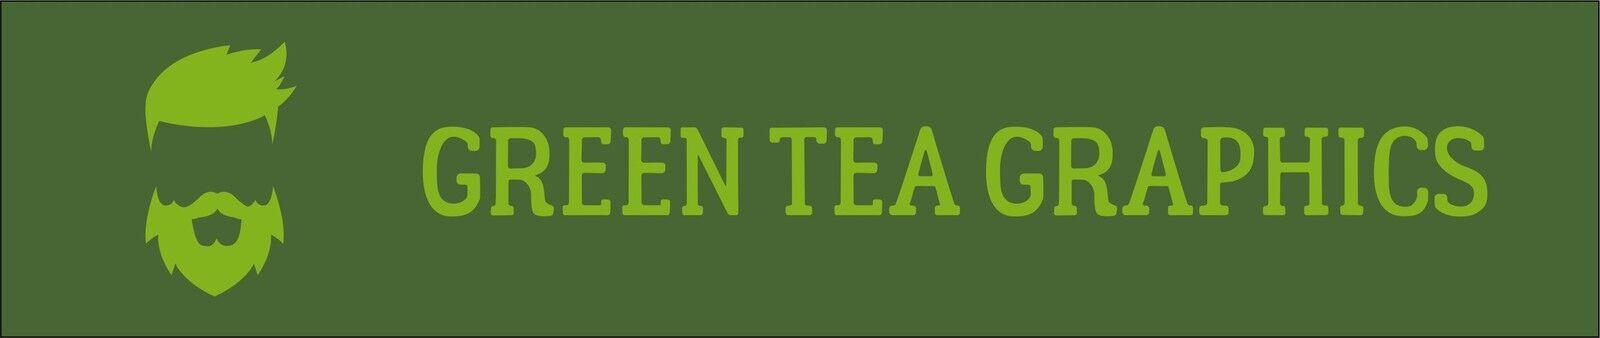 Green Tea Graphics